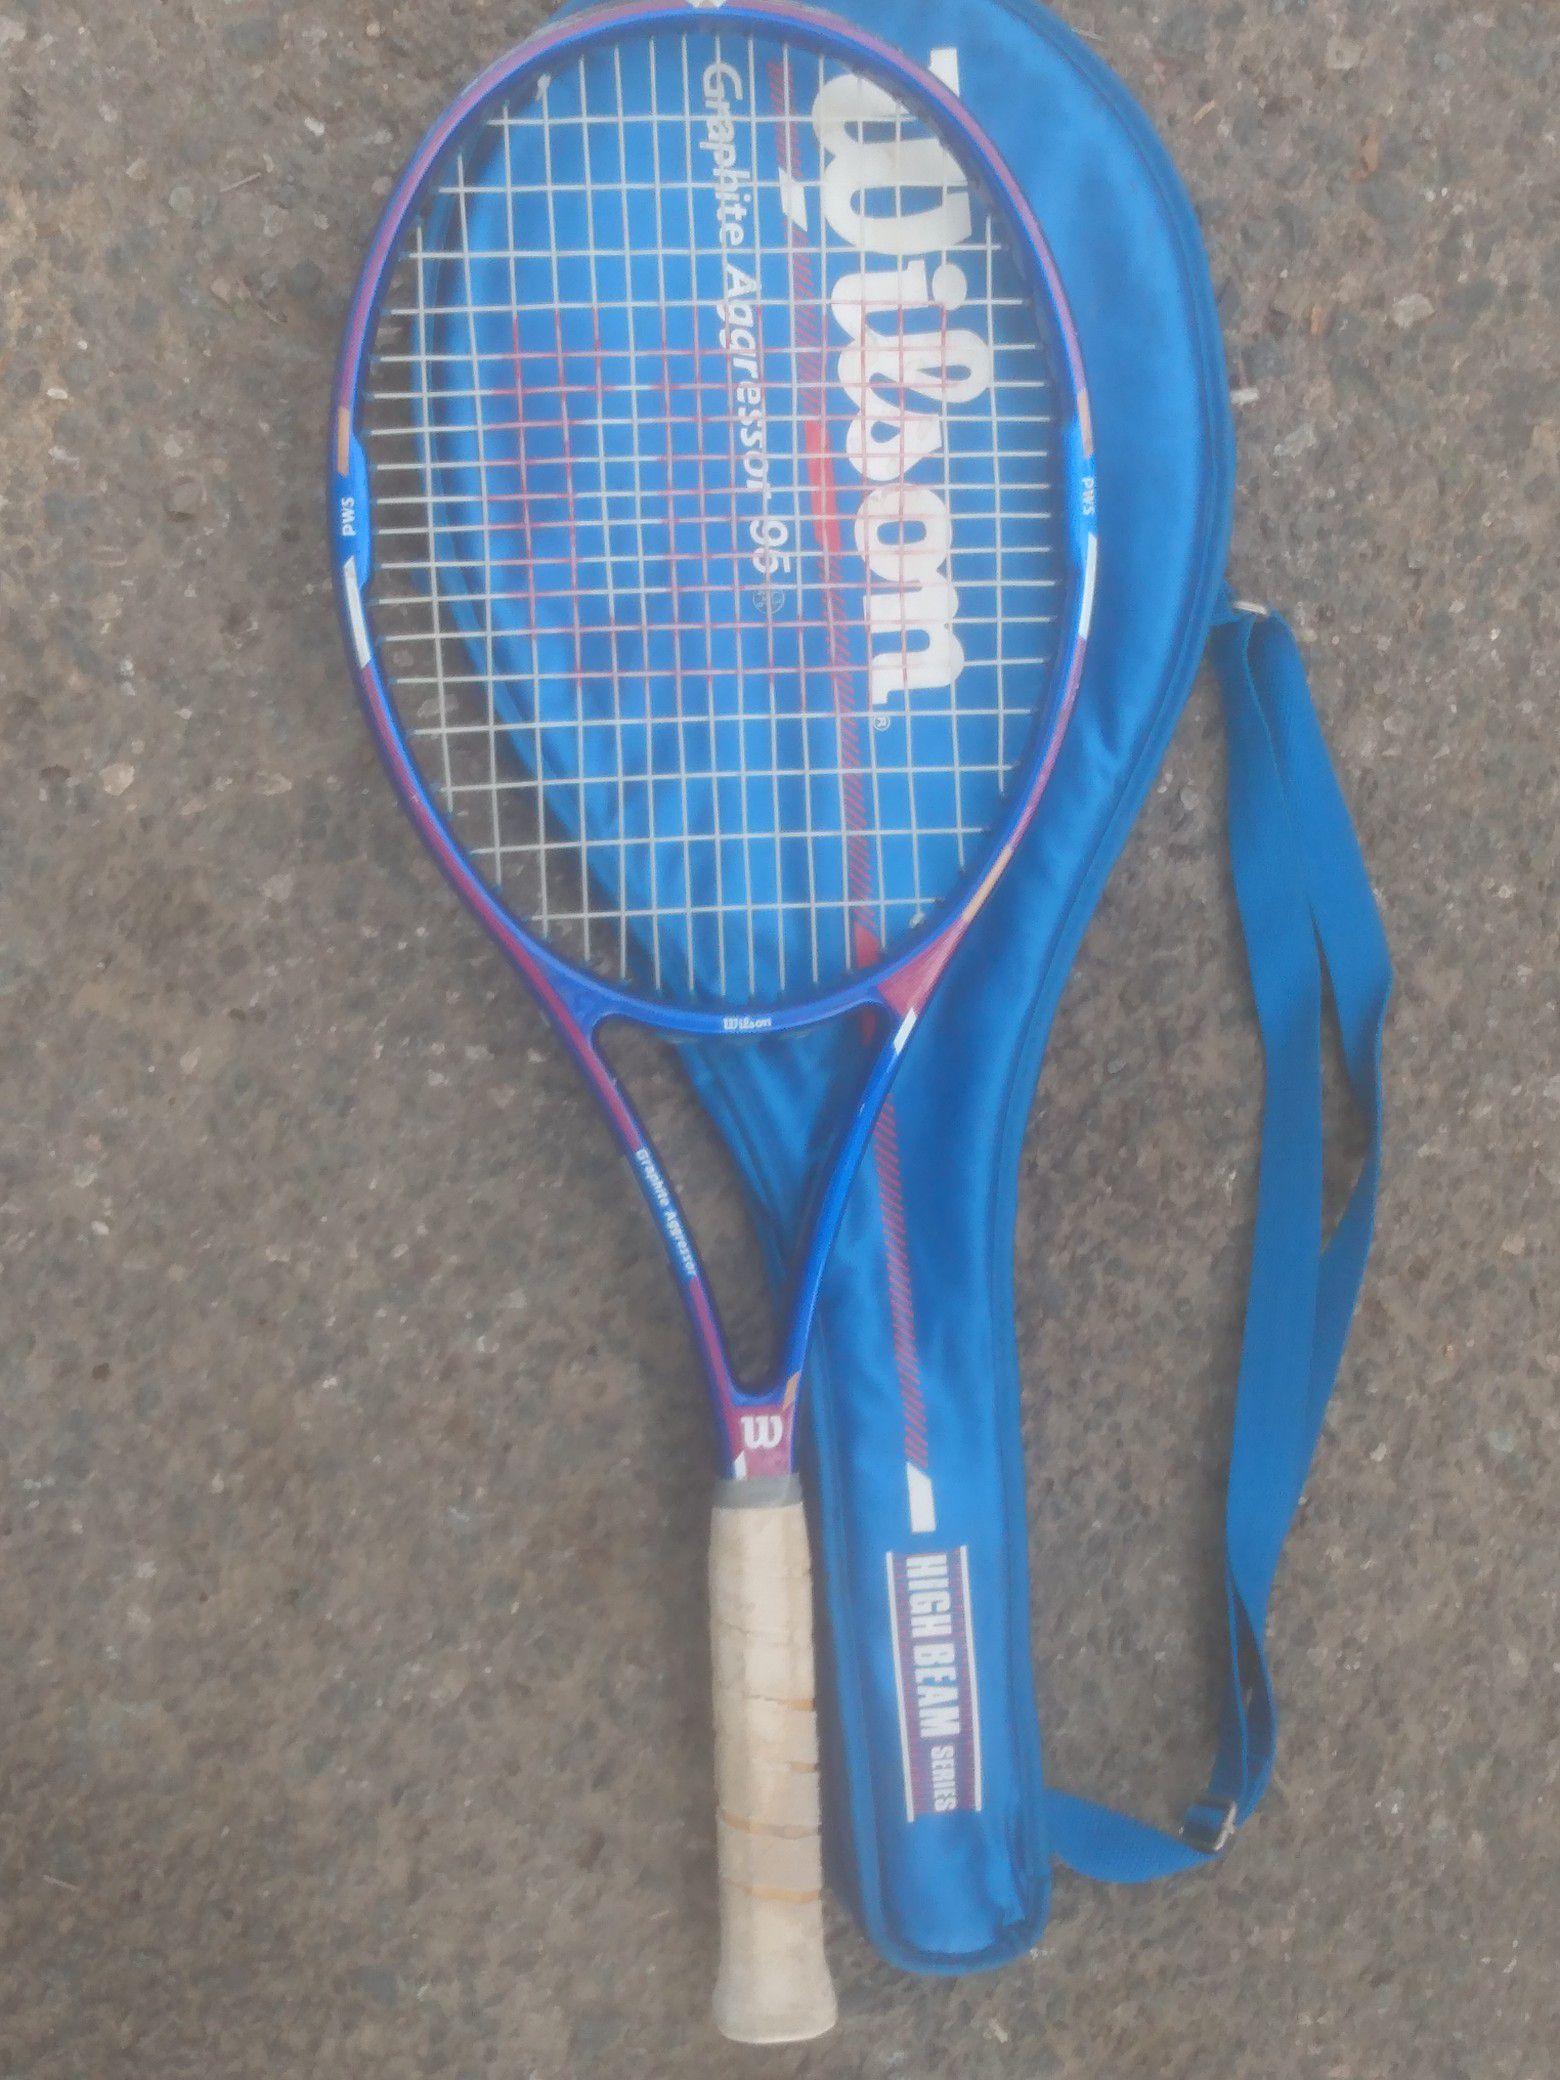 2 Wilson tennis raquets